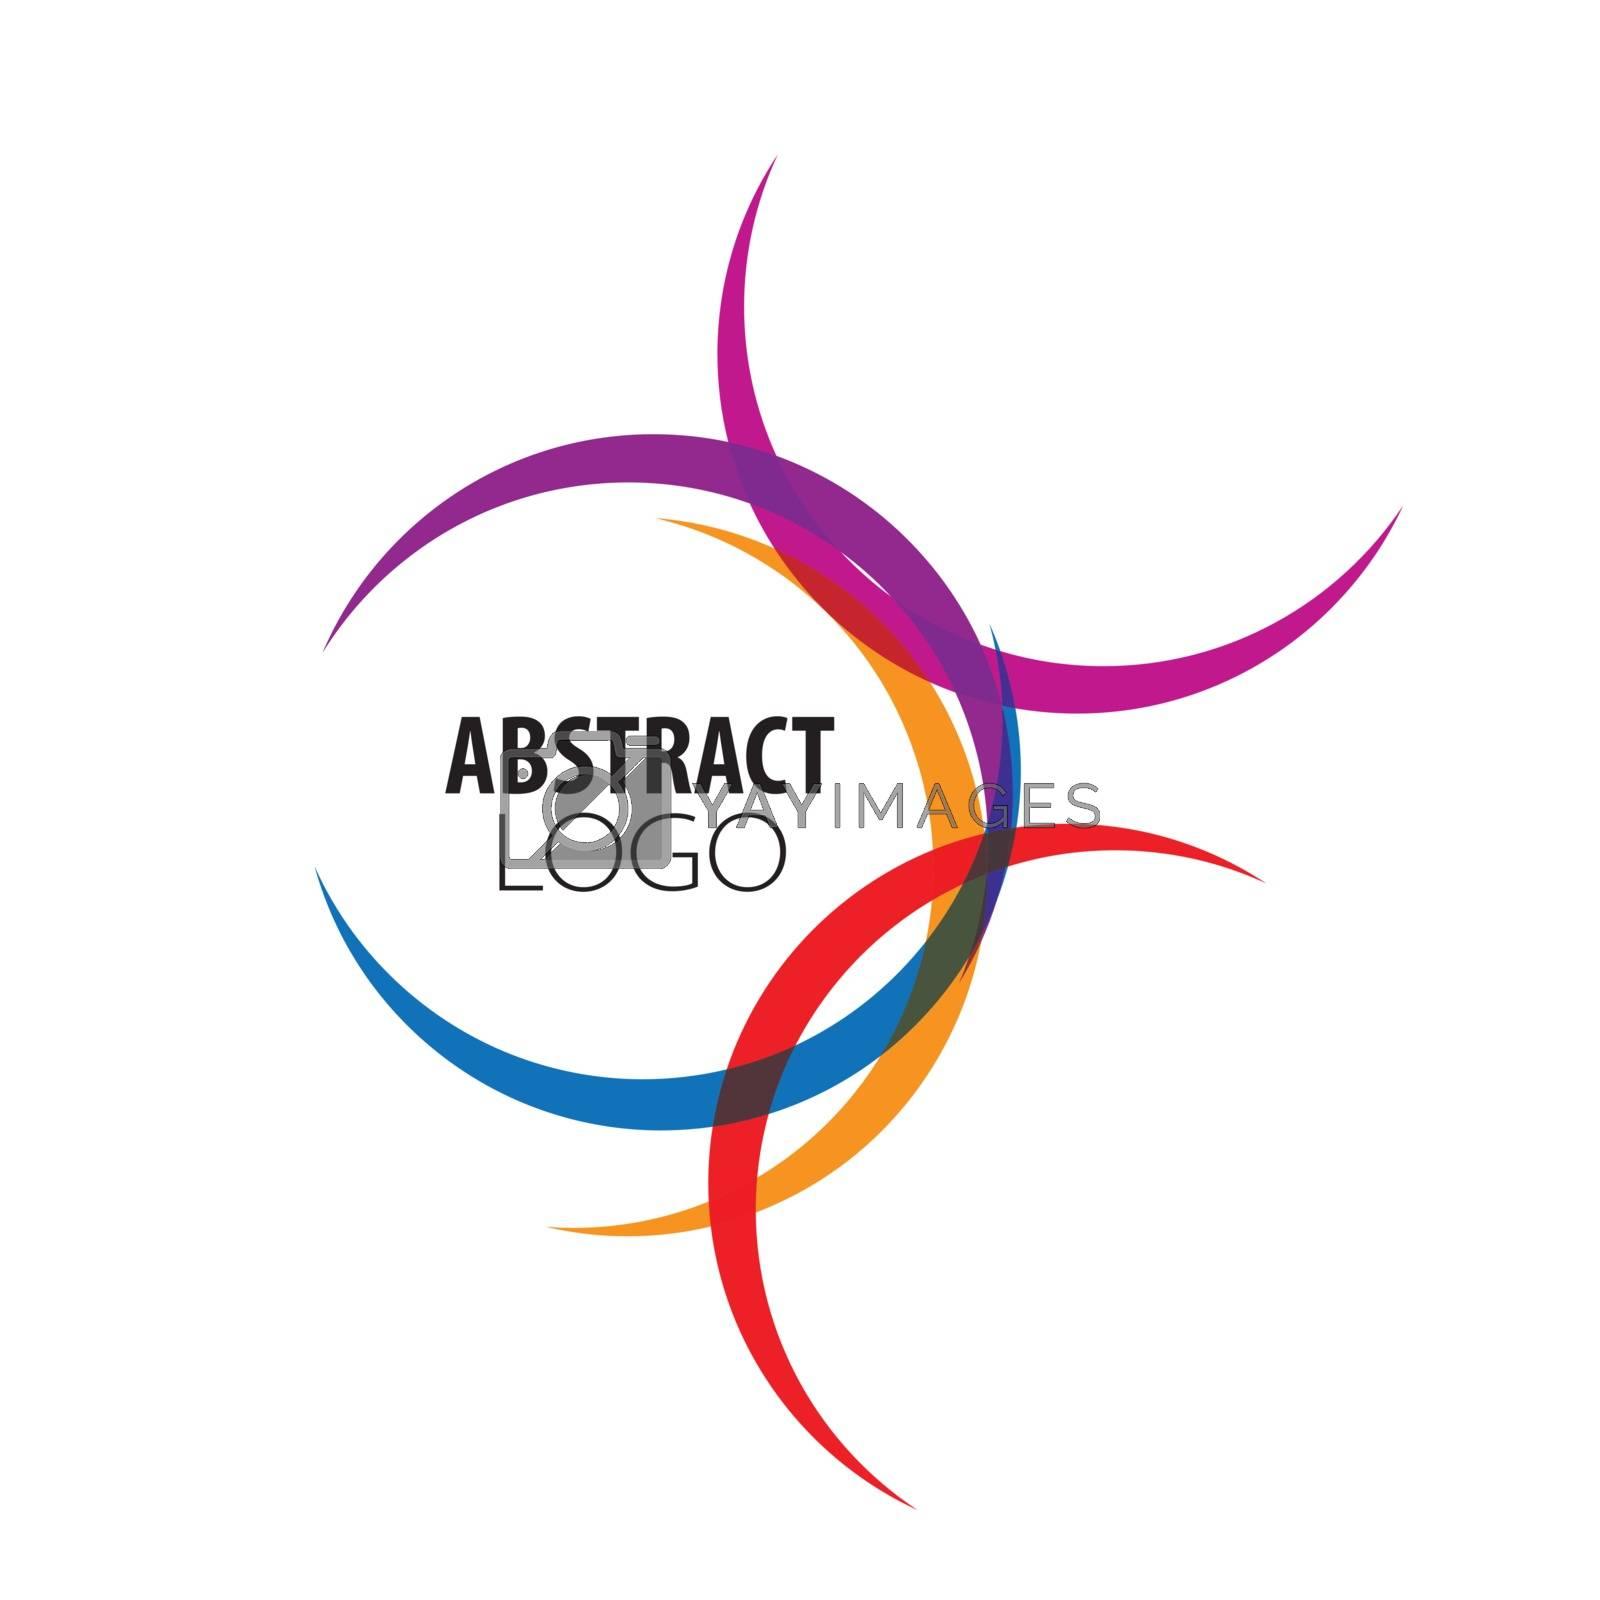 abstract logo of colored circles